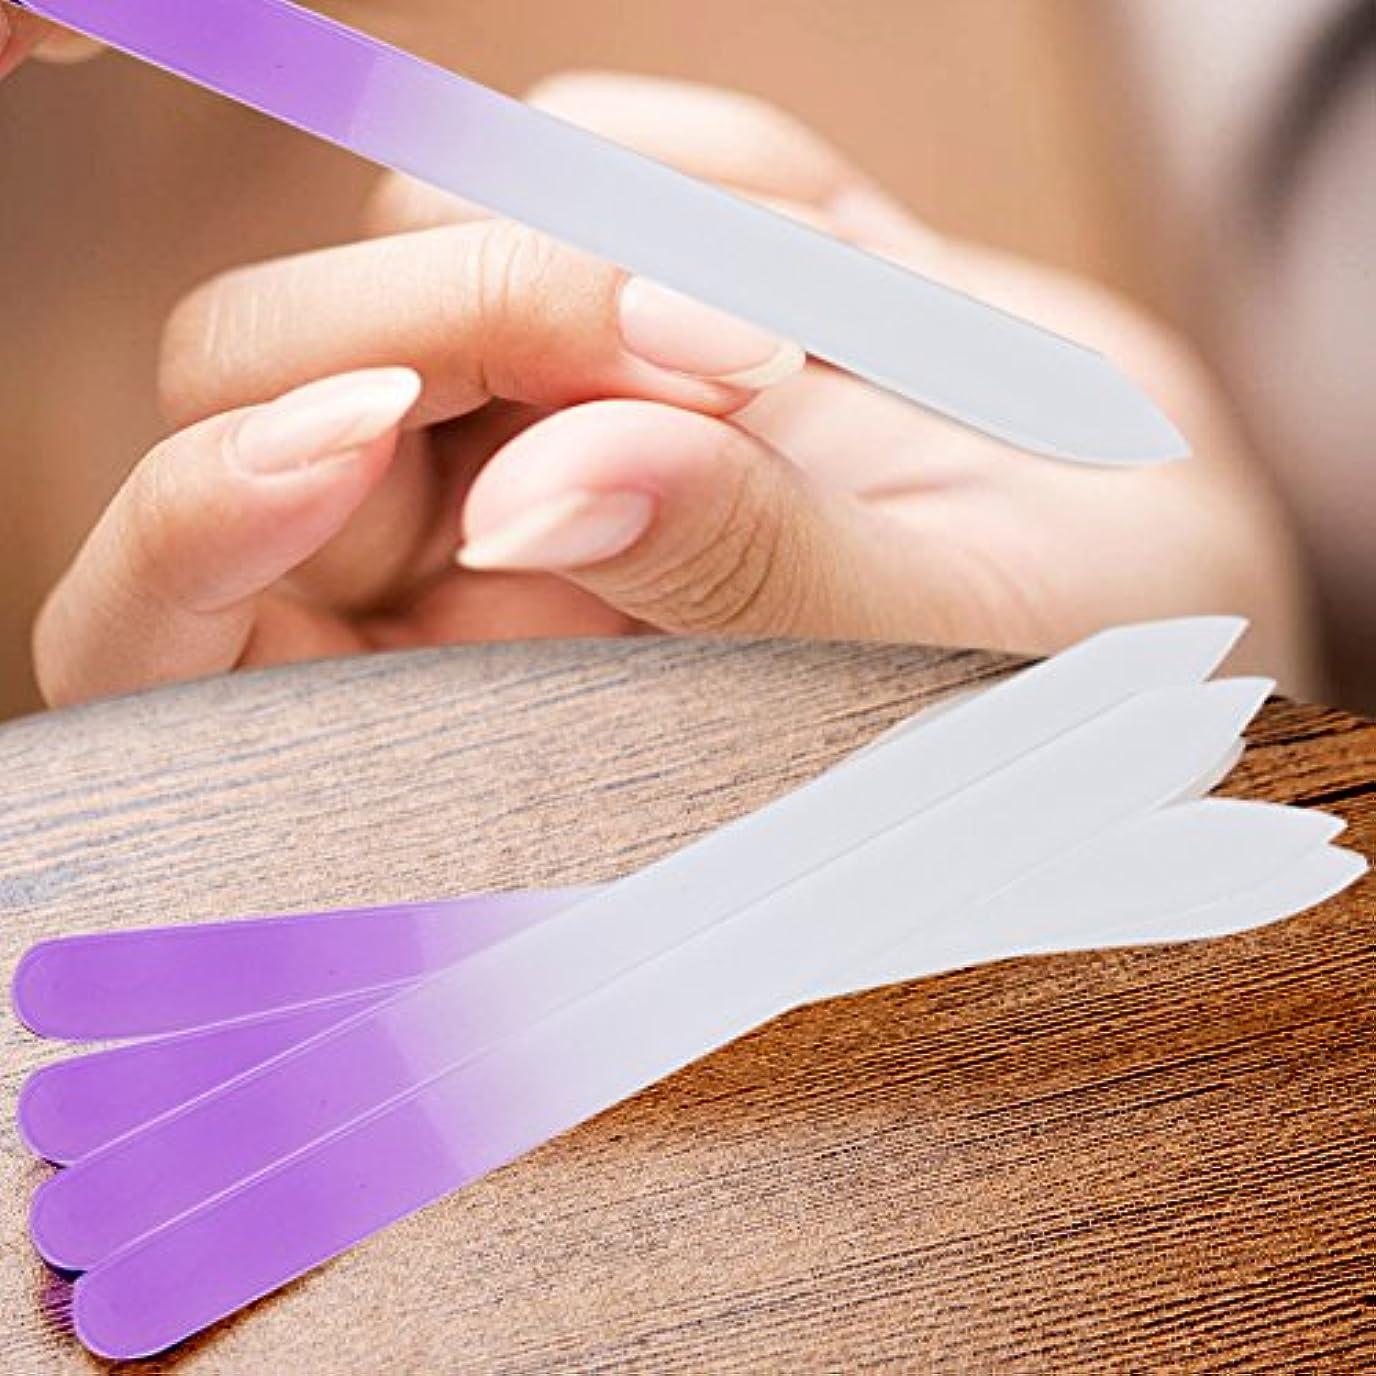 Demiawaking 爪ヤスリ ガラスネイルファイル 両面 爪やすり 爪磨き ネイルケア マニキュアファイル 4個組